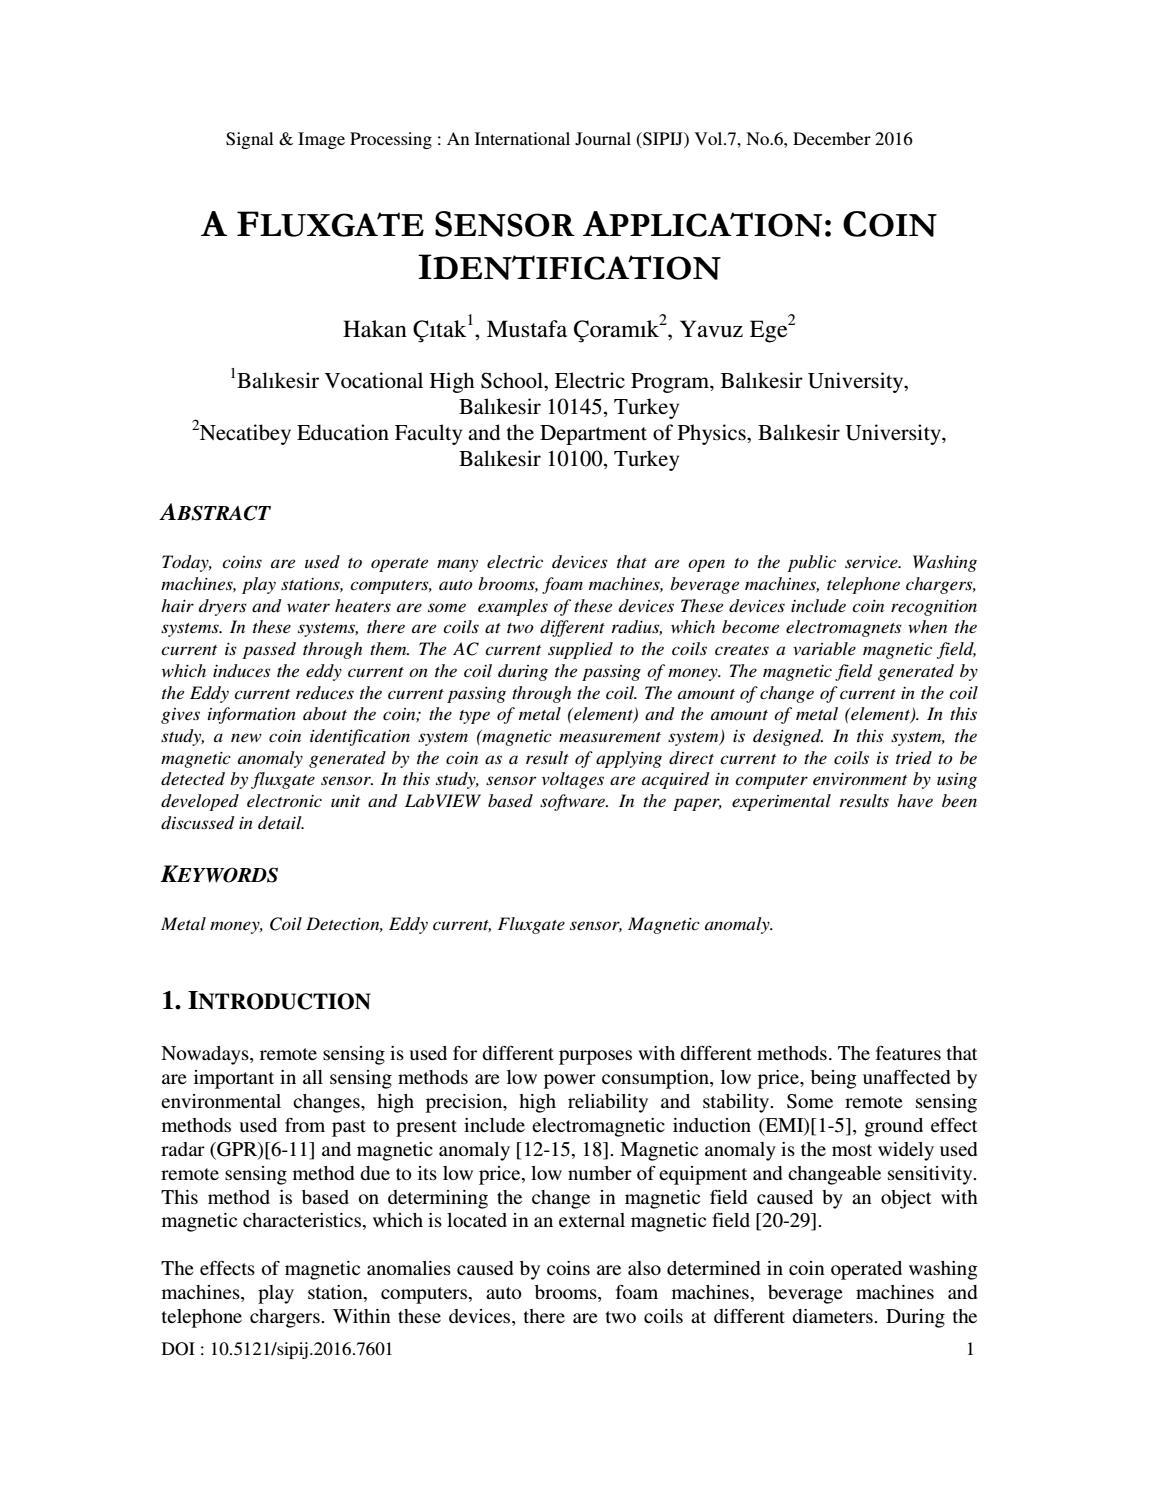 A FLUXGATE SENSOR APPLICATION: COIN IDENTIFICATION by